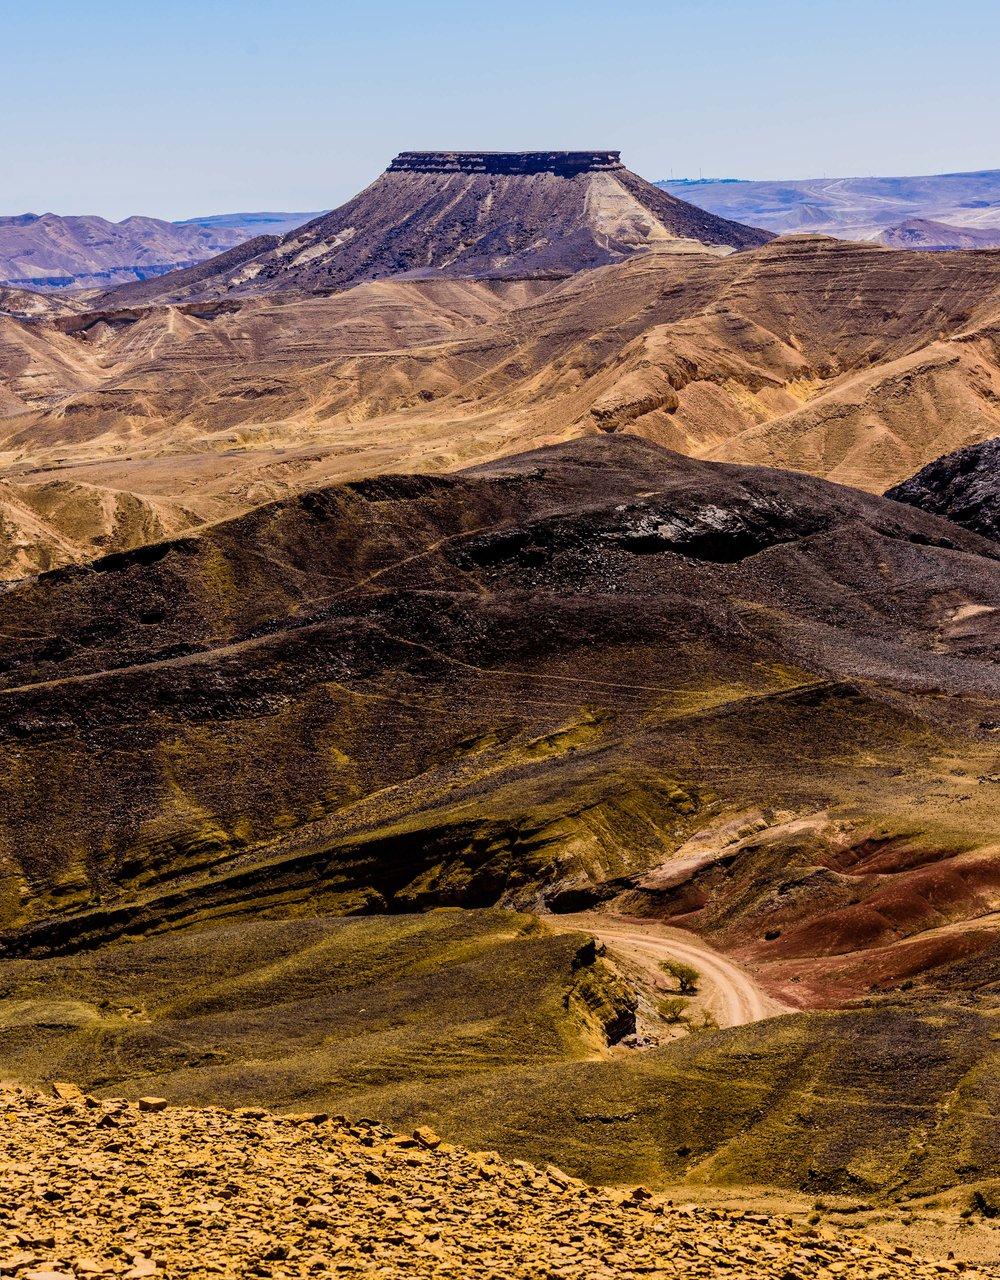 Ramon Crater,. Negev Desert, Israel 2017